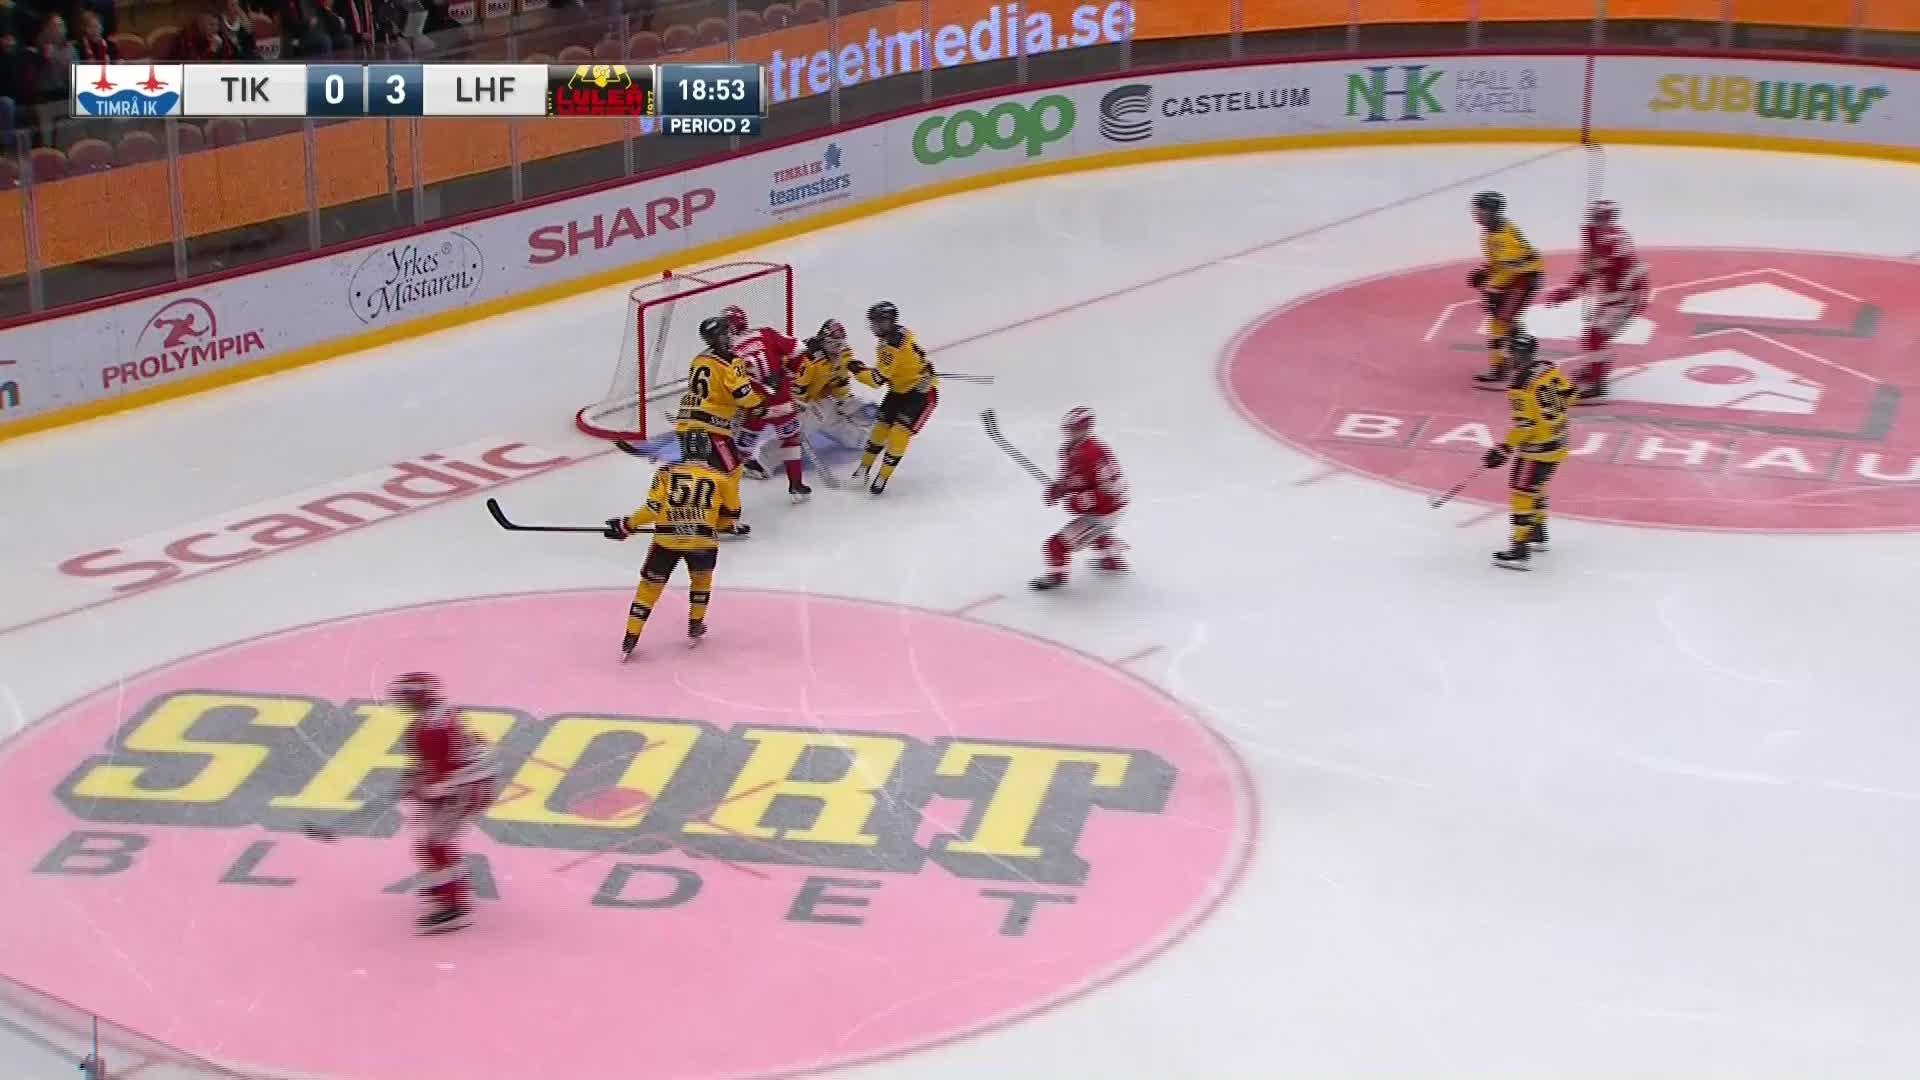 Timrå IK - Luleå Hockey 1-3